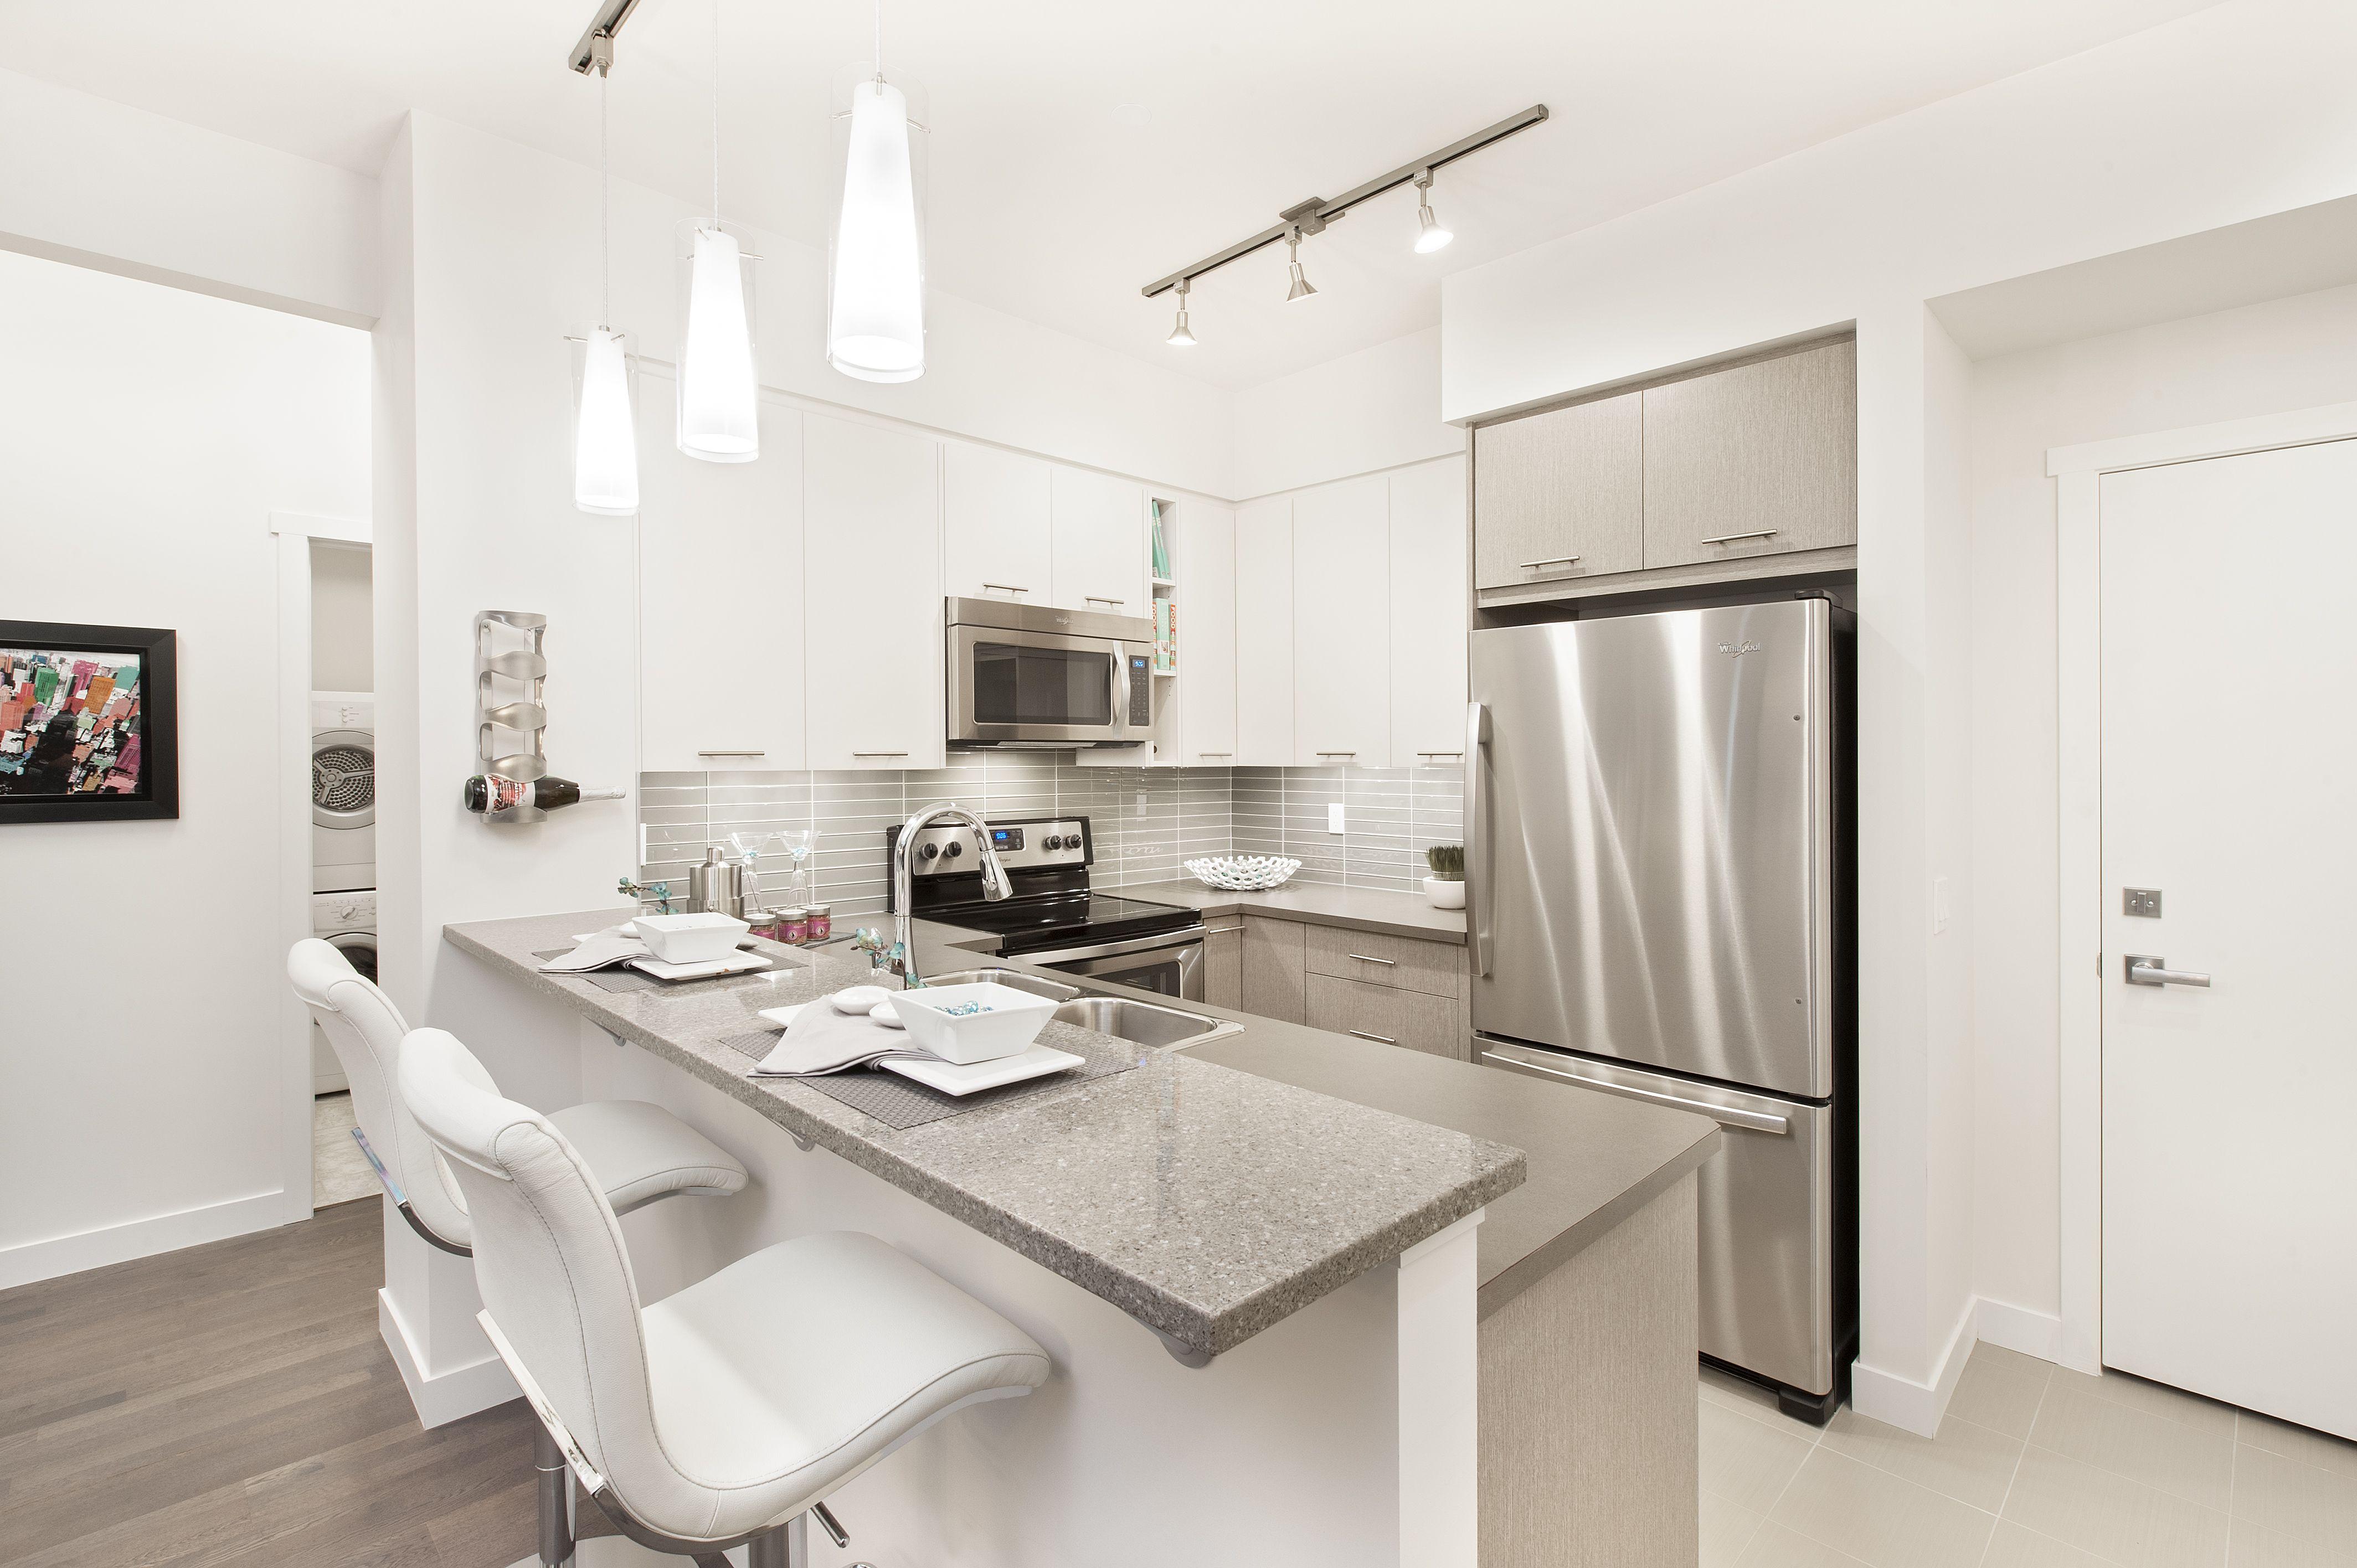 Kitchen Furniture Calgary Bright Fresh Kitchen At Sawyer Silverado New Calgary Condos By Avi